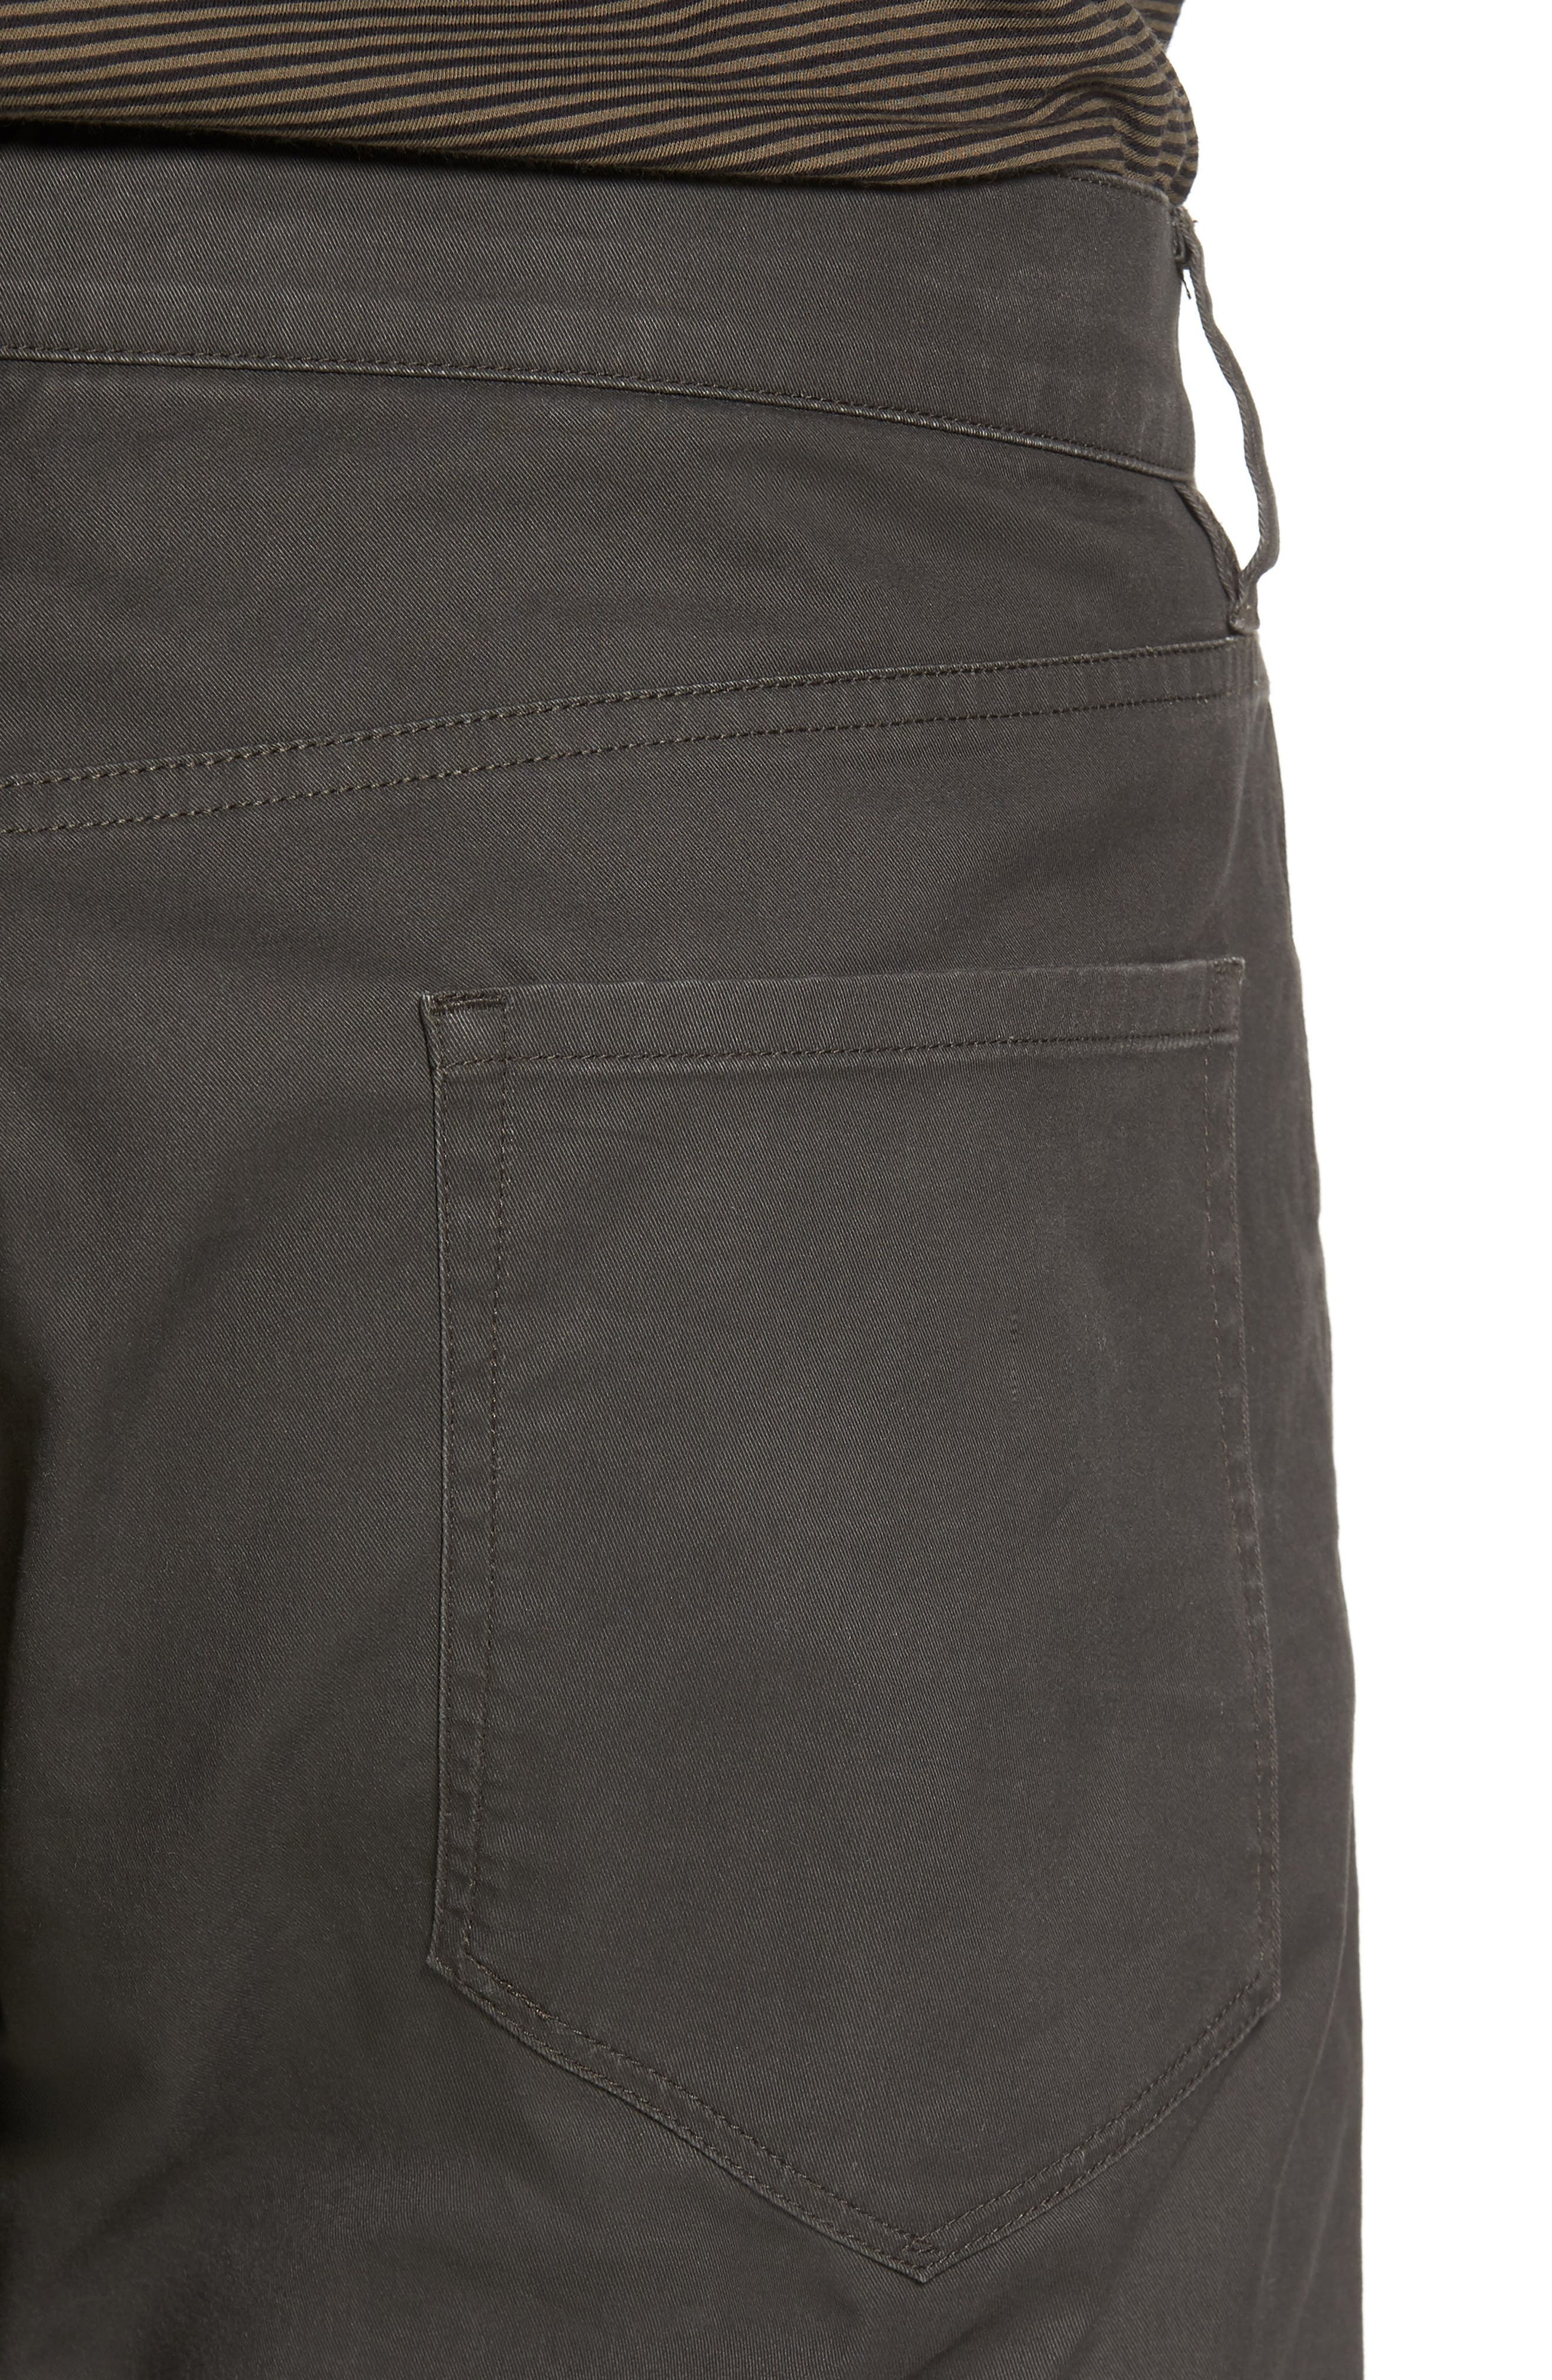 Slim Fit Five-Pocket Pants,                             Alternate thumbnail 4, color,                             Charcoal